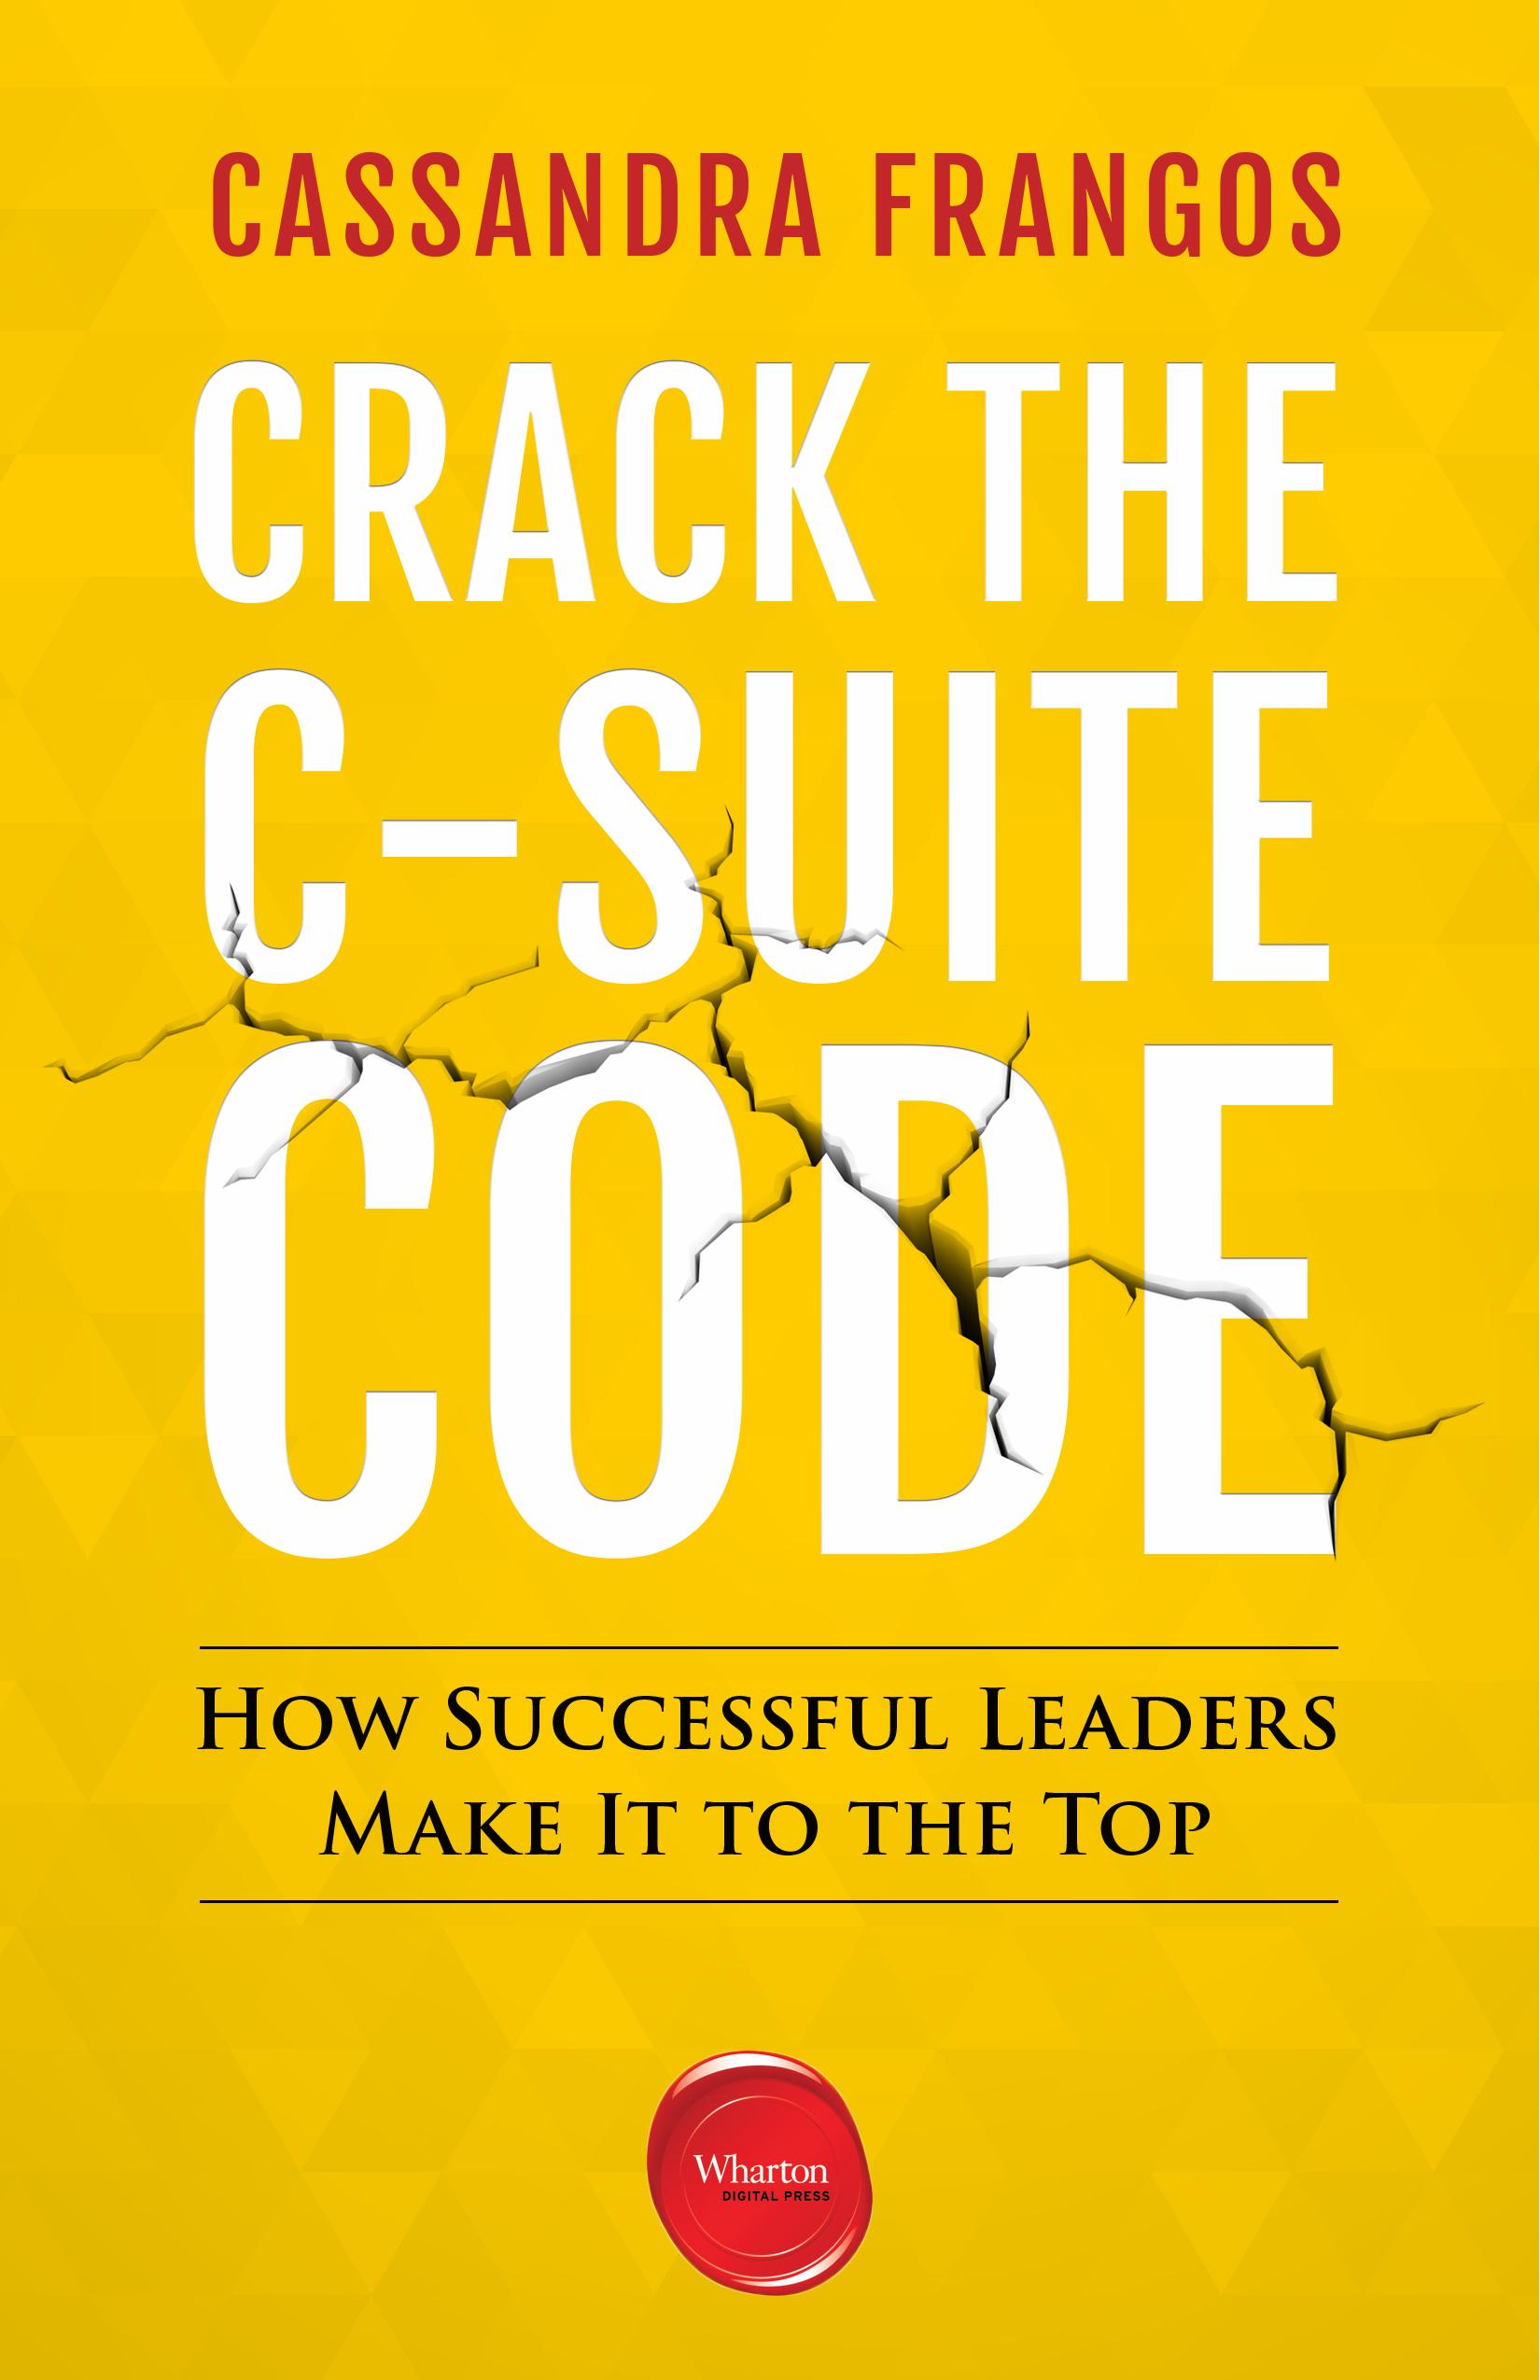 Crack_the_C-Suite_Code-cover.jpg